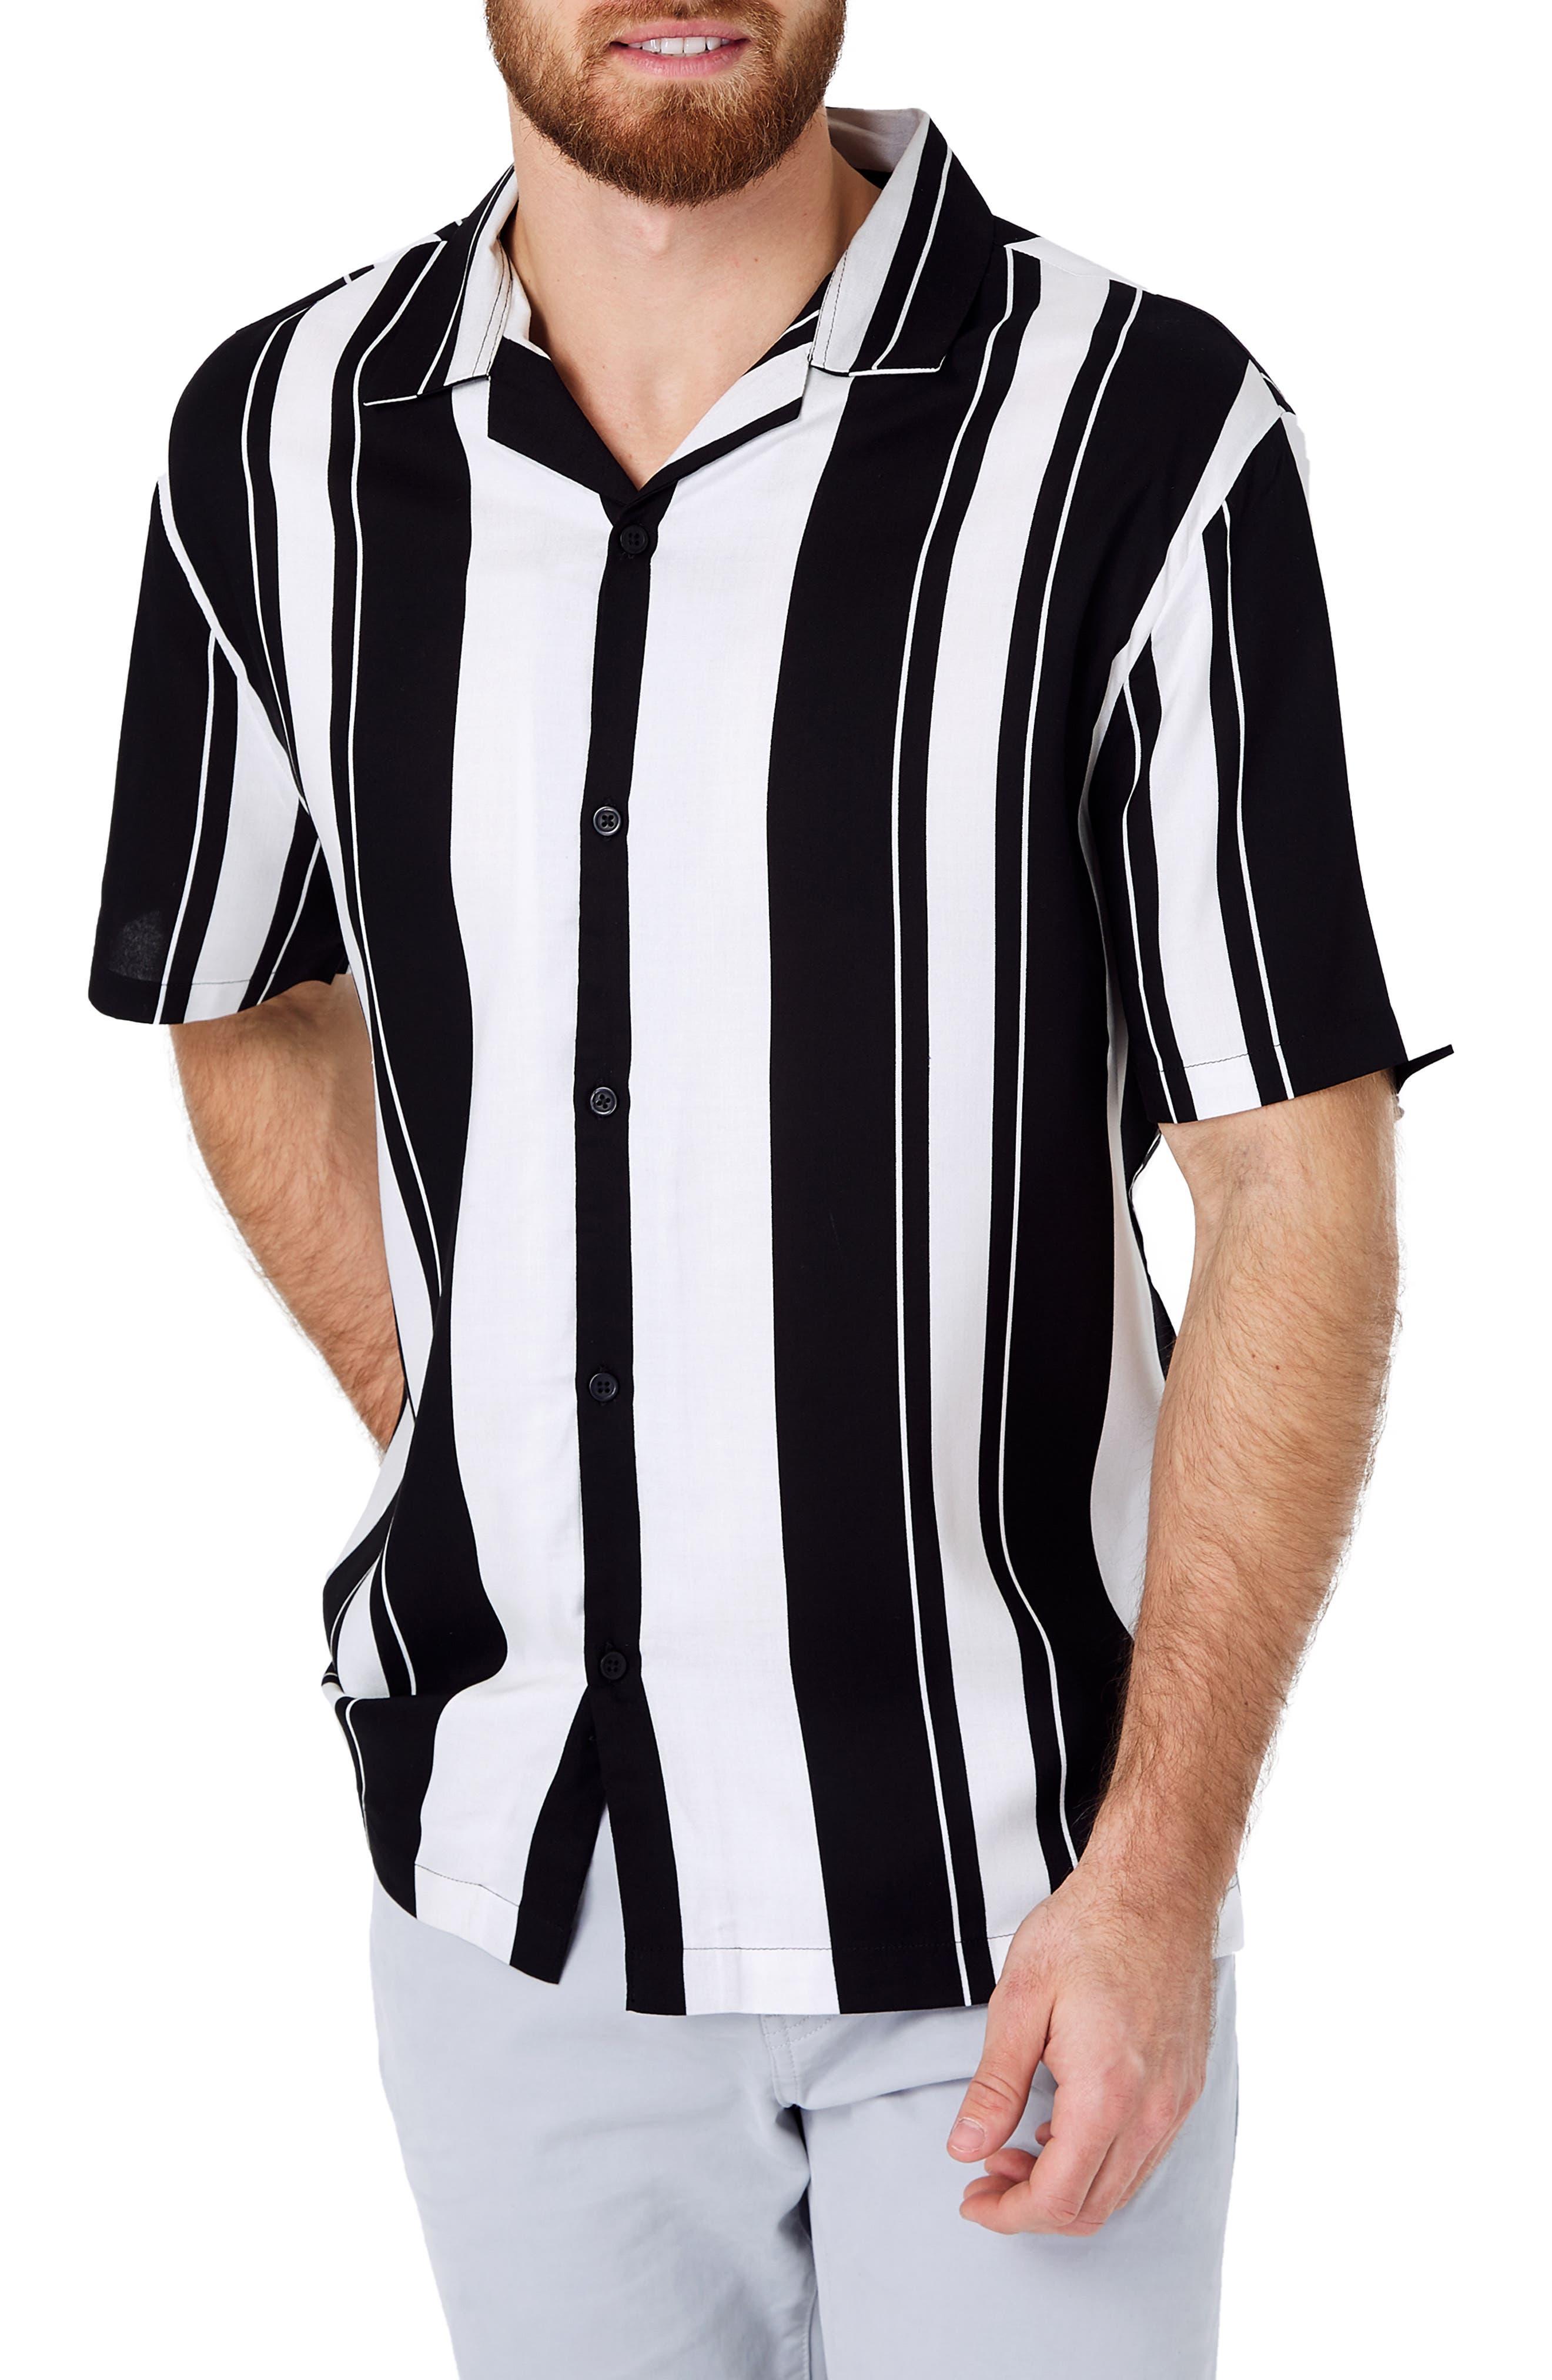 1950s Mens Shirts | Retro Bowling Shirts, Vintage Hawaiian Shirts Mens 7 Diamonds All Shook Up Slim Fit Stripe Camp Shirt Size X-Large - Black $69.00 AT vintagedancer.com